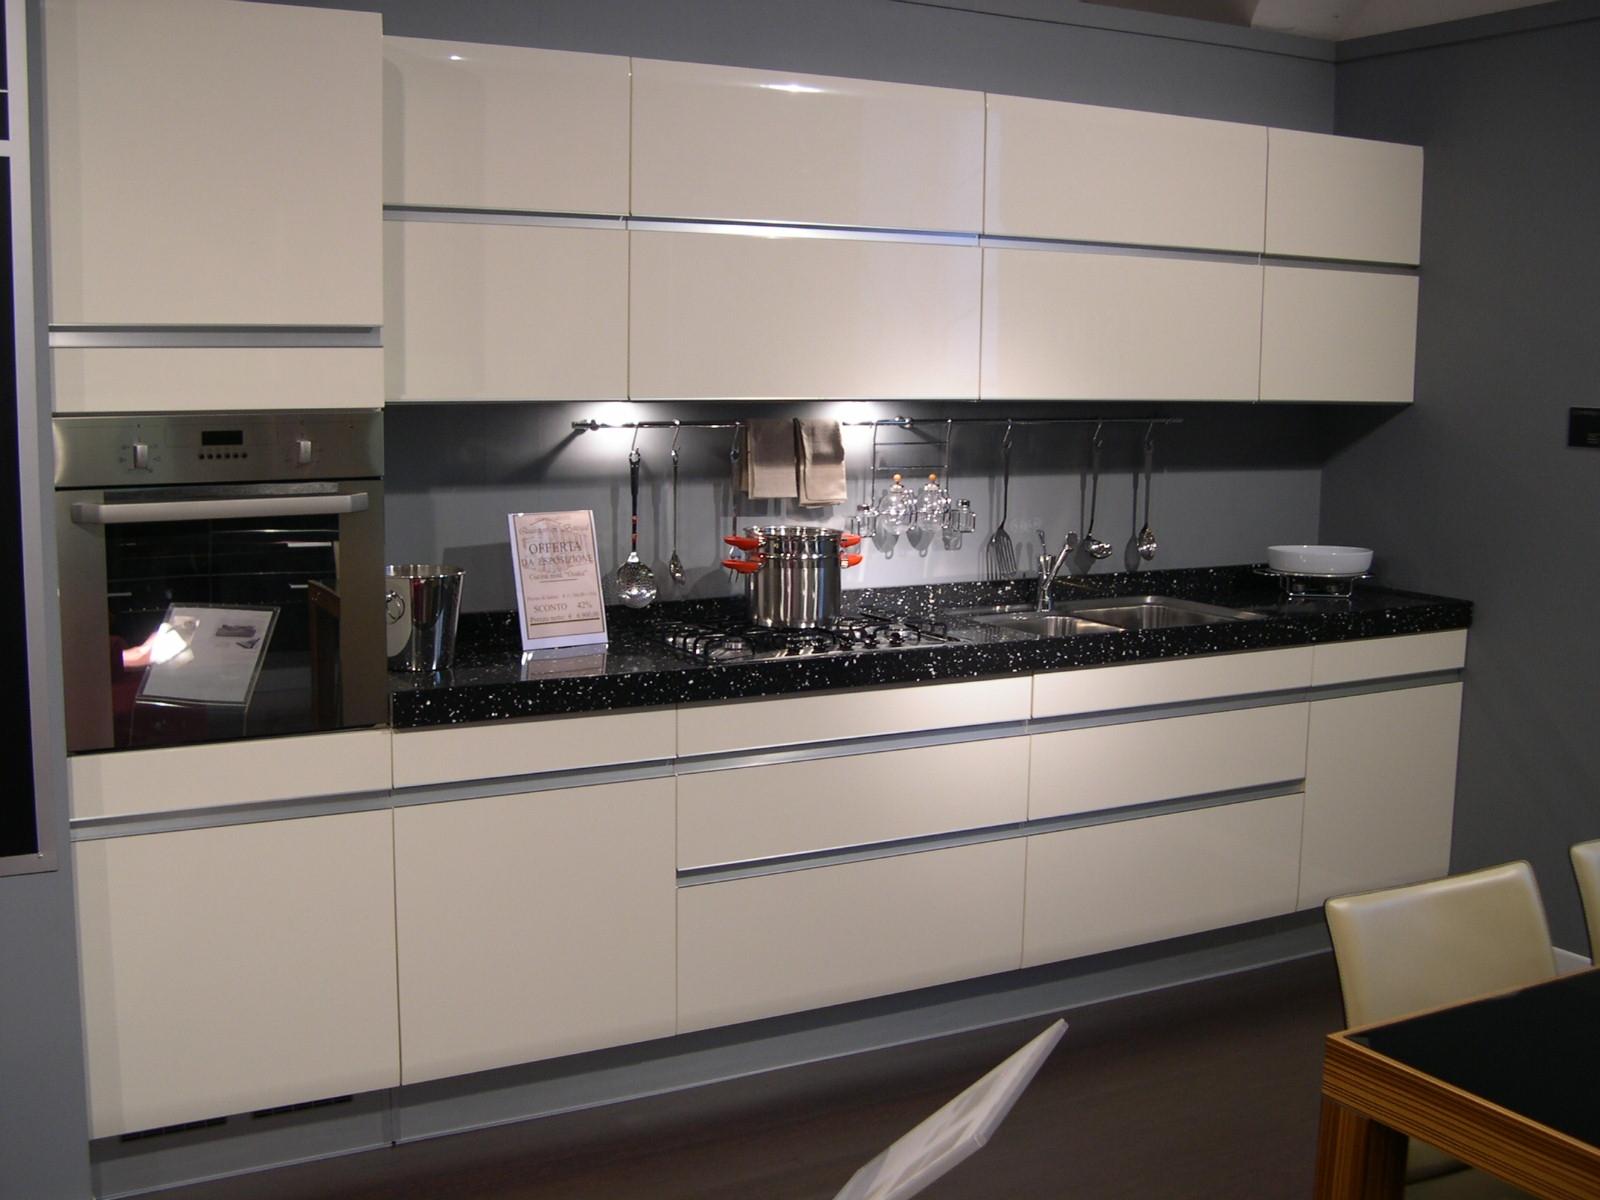 Cucine moderne bianche e nere idee creative di interni e - Cucine nere lucide ...